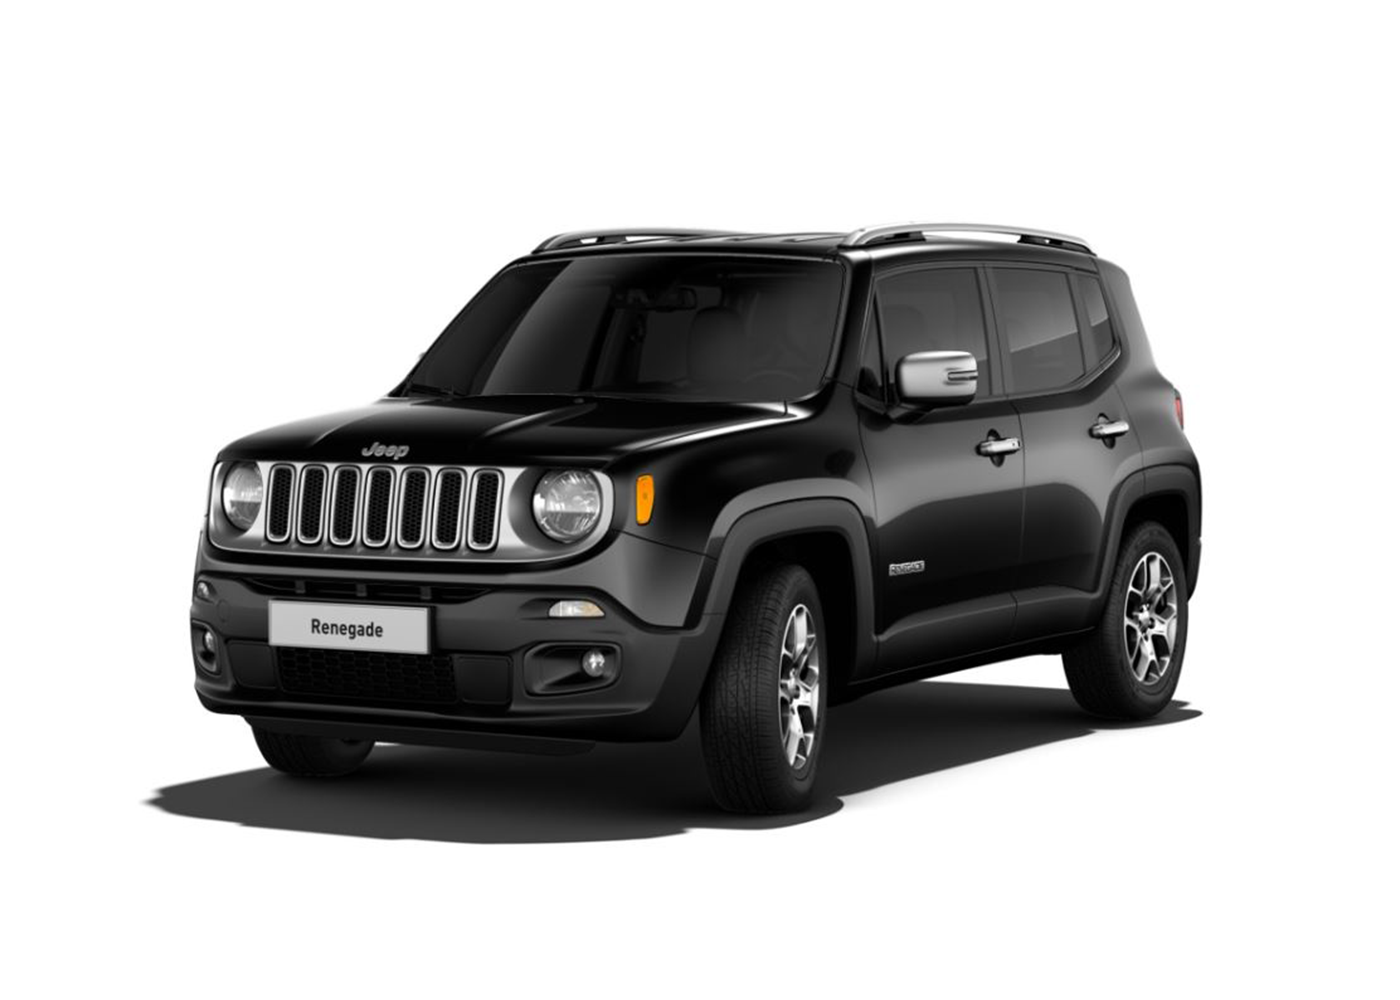 JEEP Renegade 1.6 Mjt 120 CV Limited - Auto Usate ...